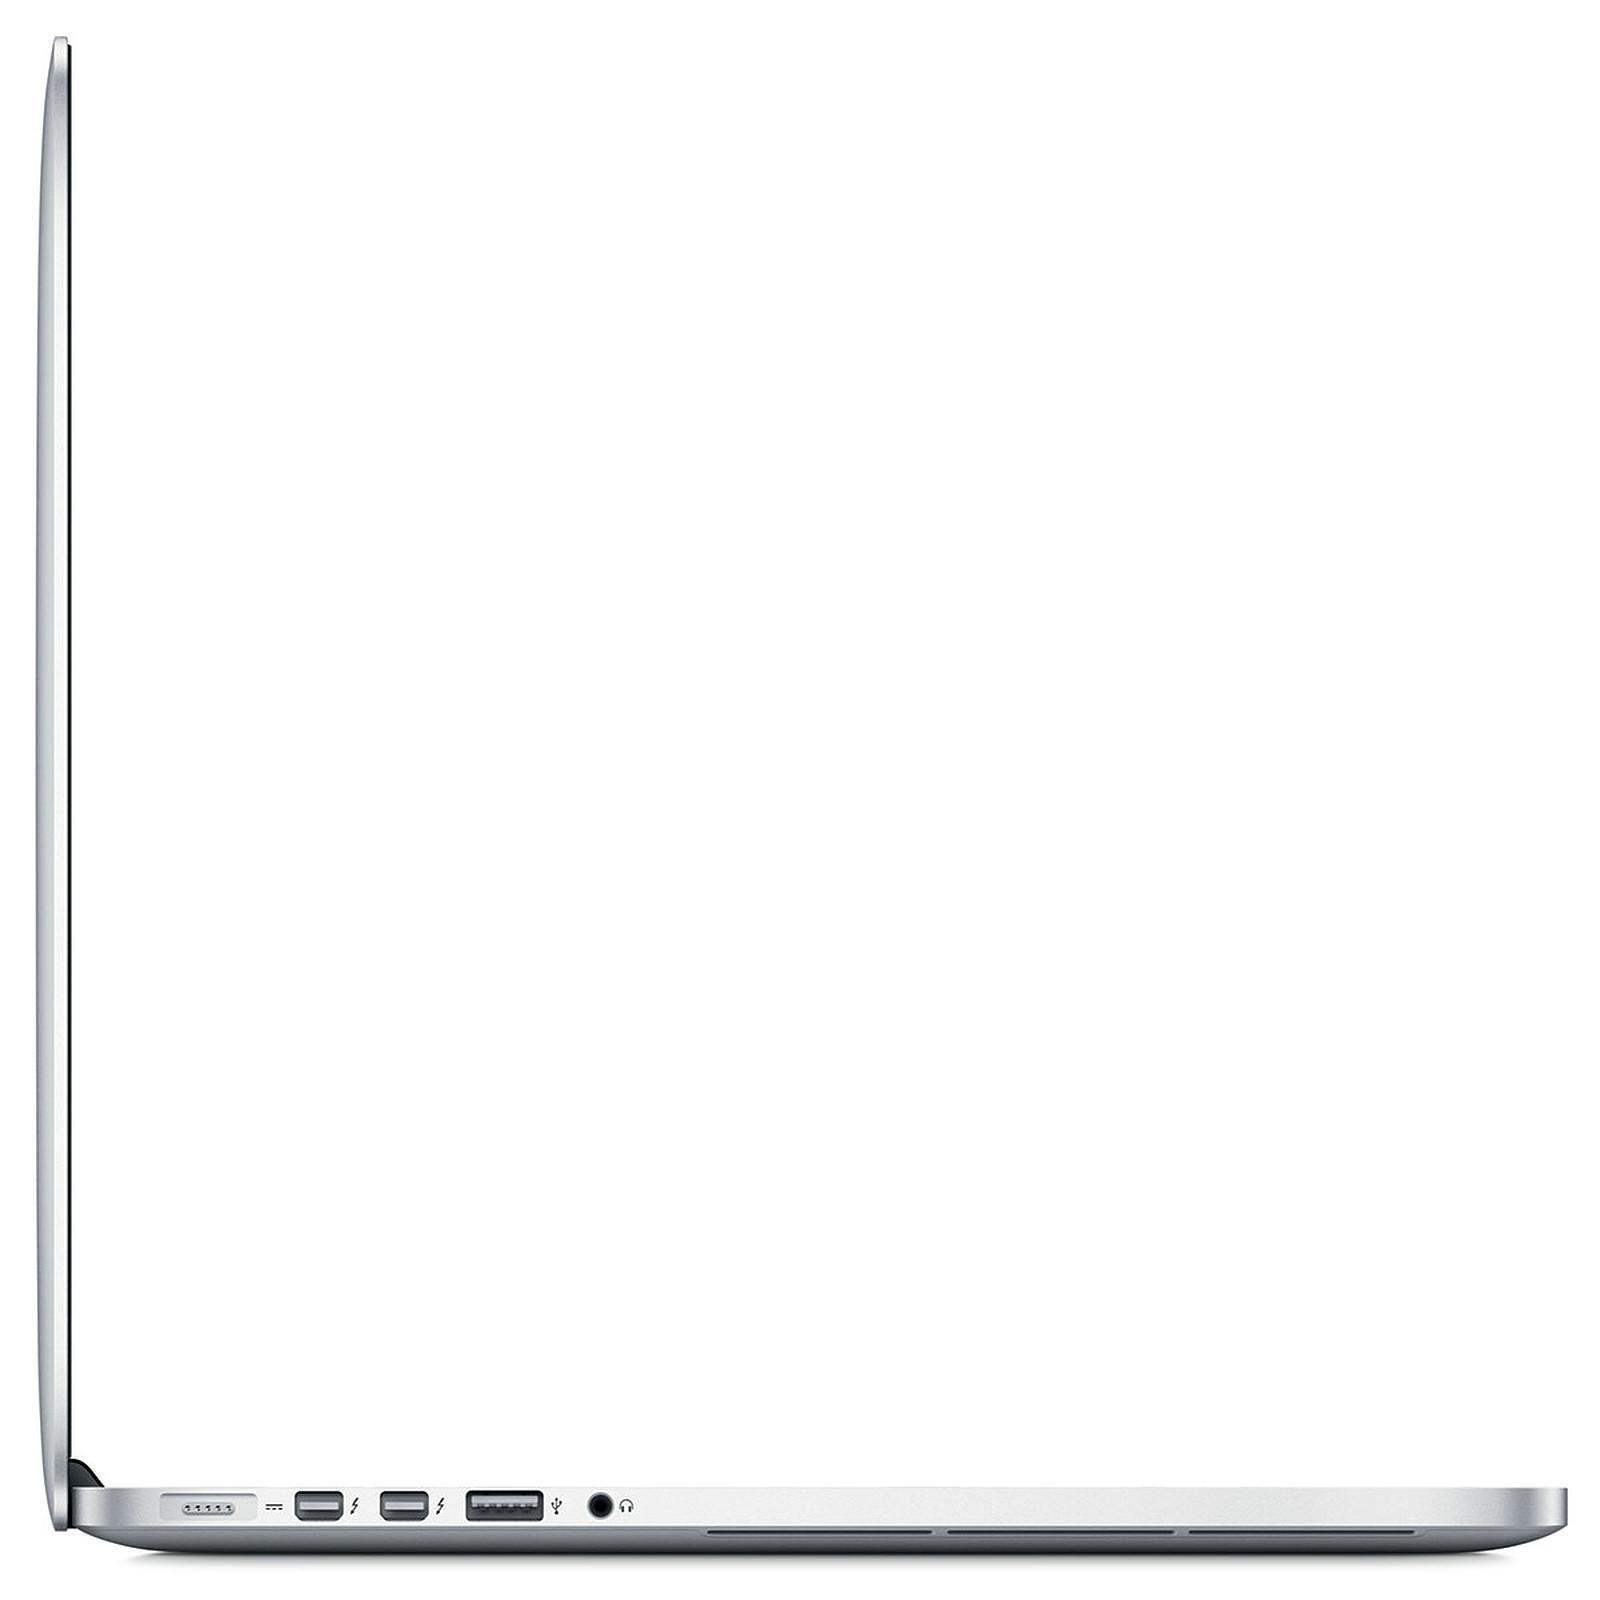 MacBook Pro Retina 15,4-inch (2015) - Core i7 - 16GB - SSD 256 GB QWERTY - Espanhol